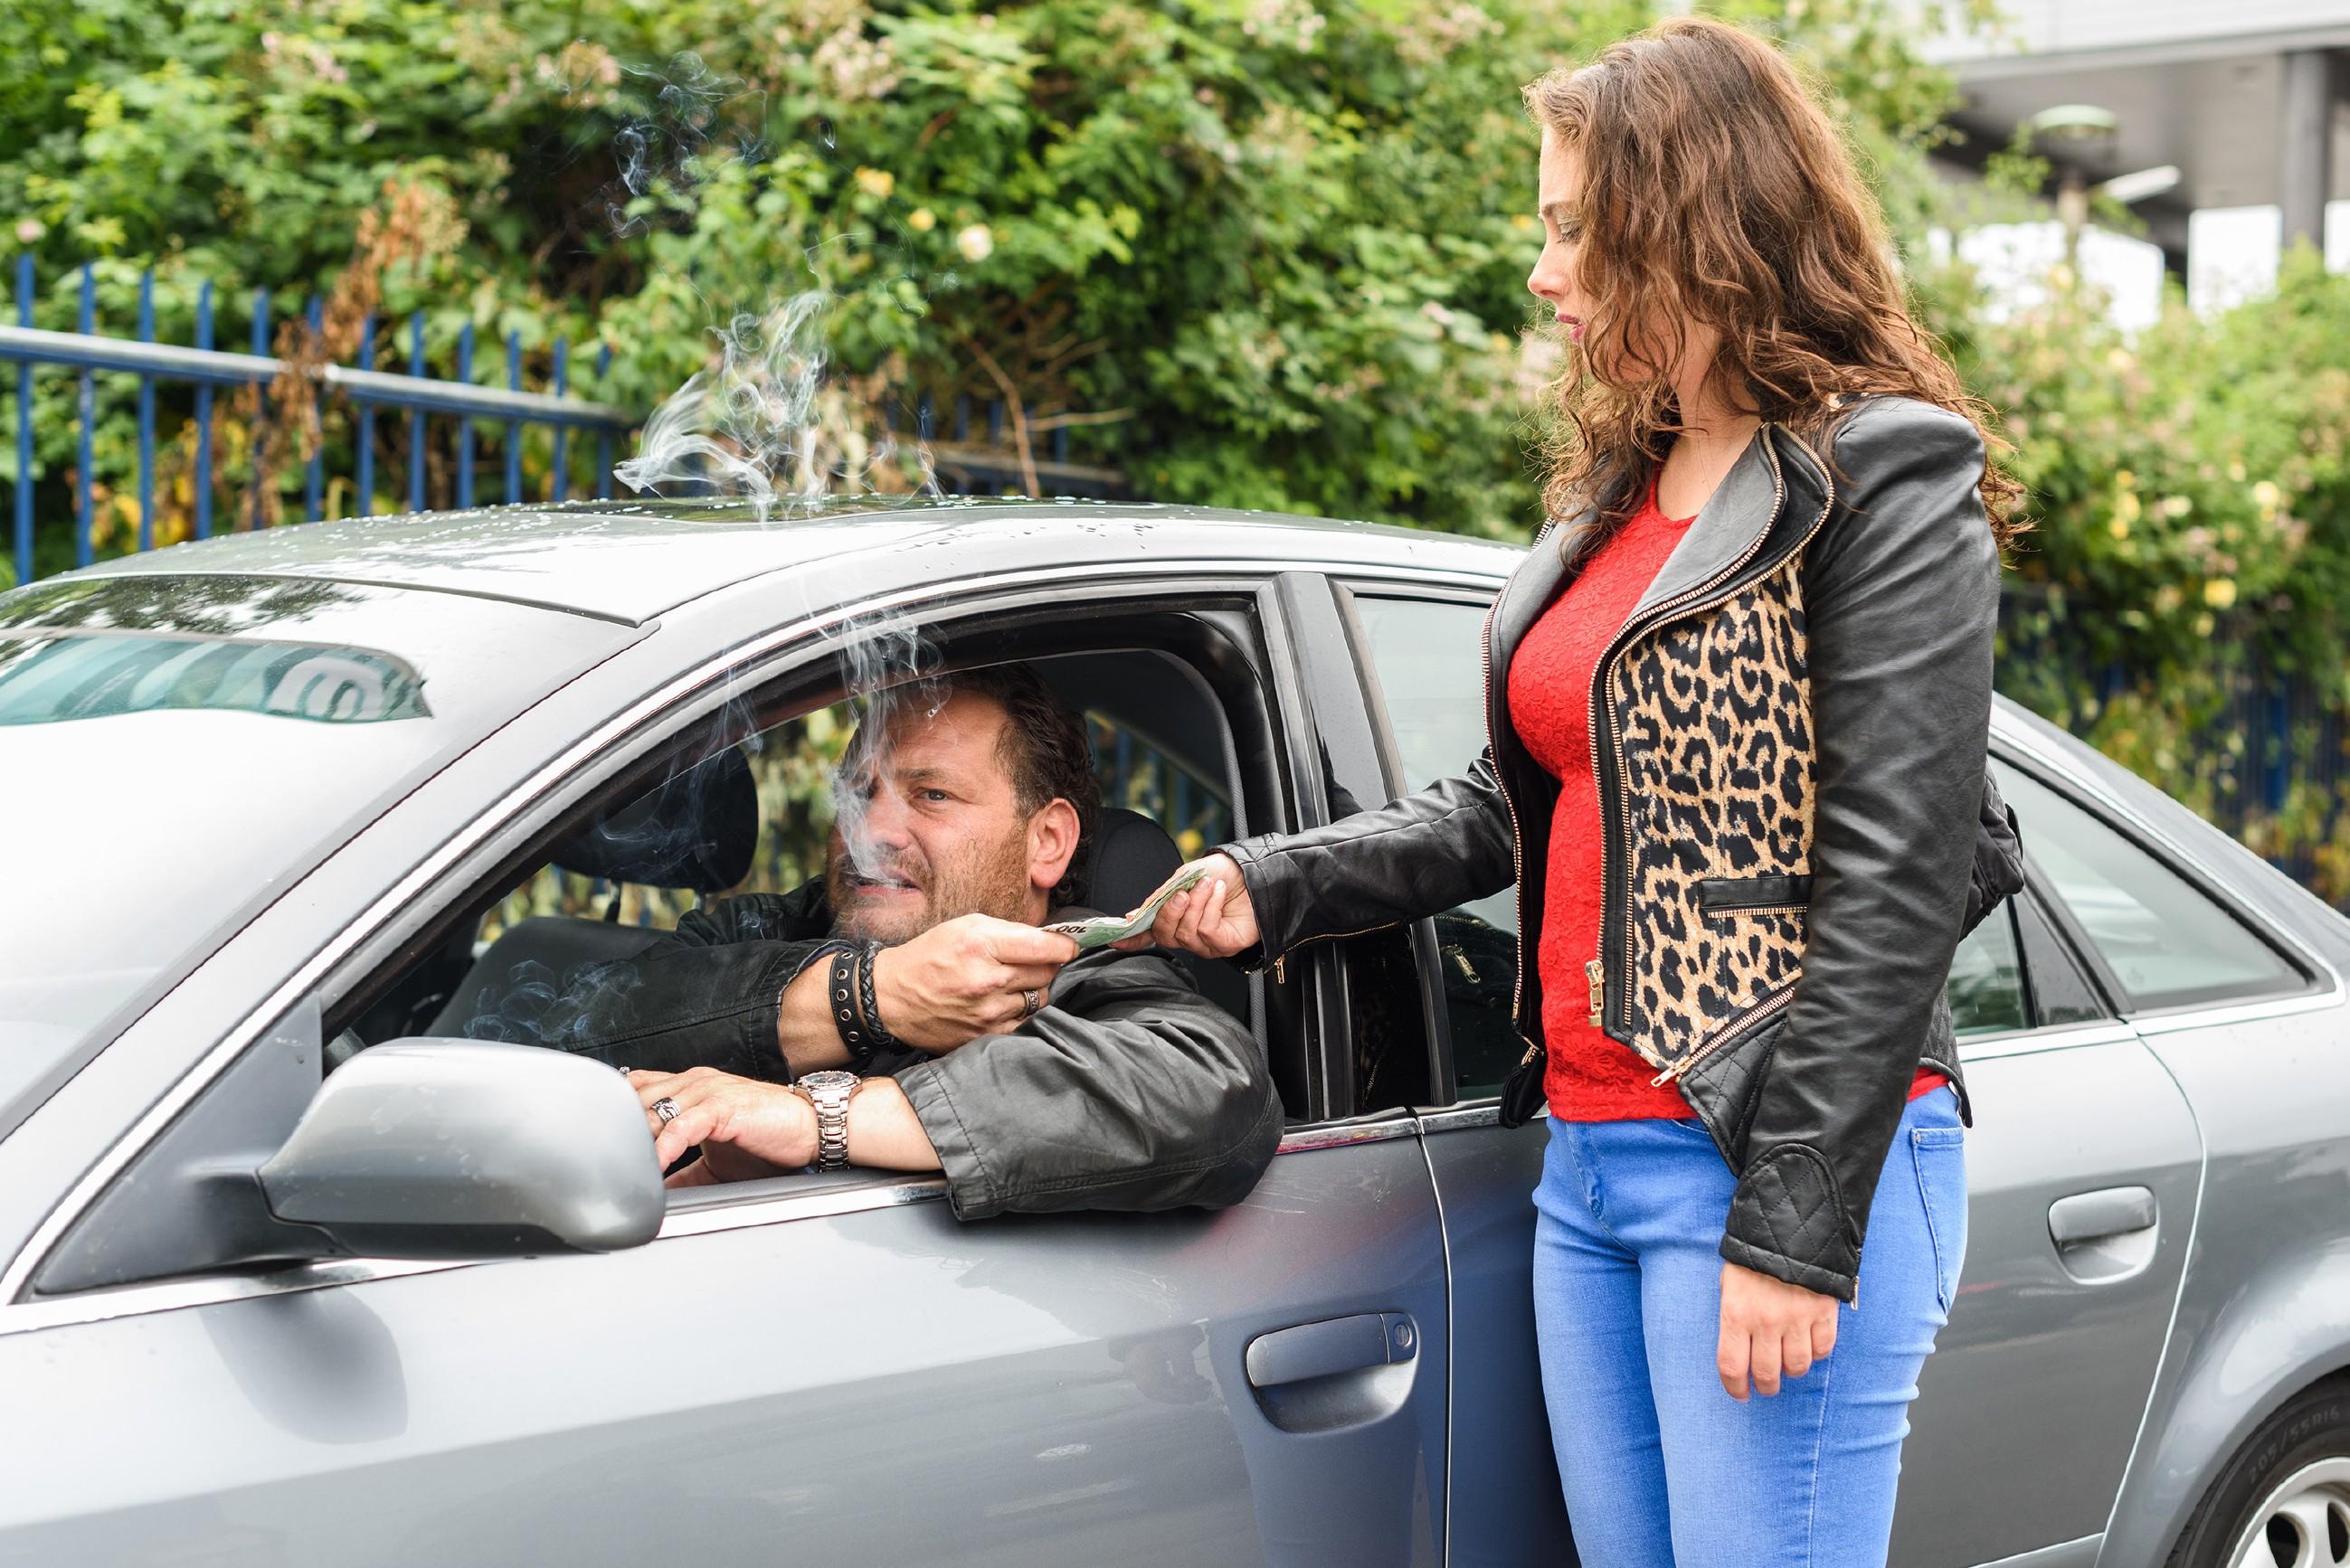 Kerber (Marcus Jakovljevic) stellt Carmen (Heike Warmuth) ein letztes Ultimatum... (Quelle: RTL / Julia Feldhagen)